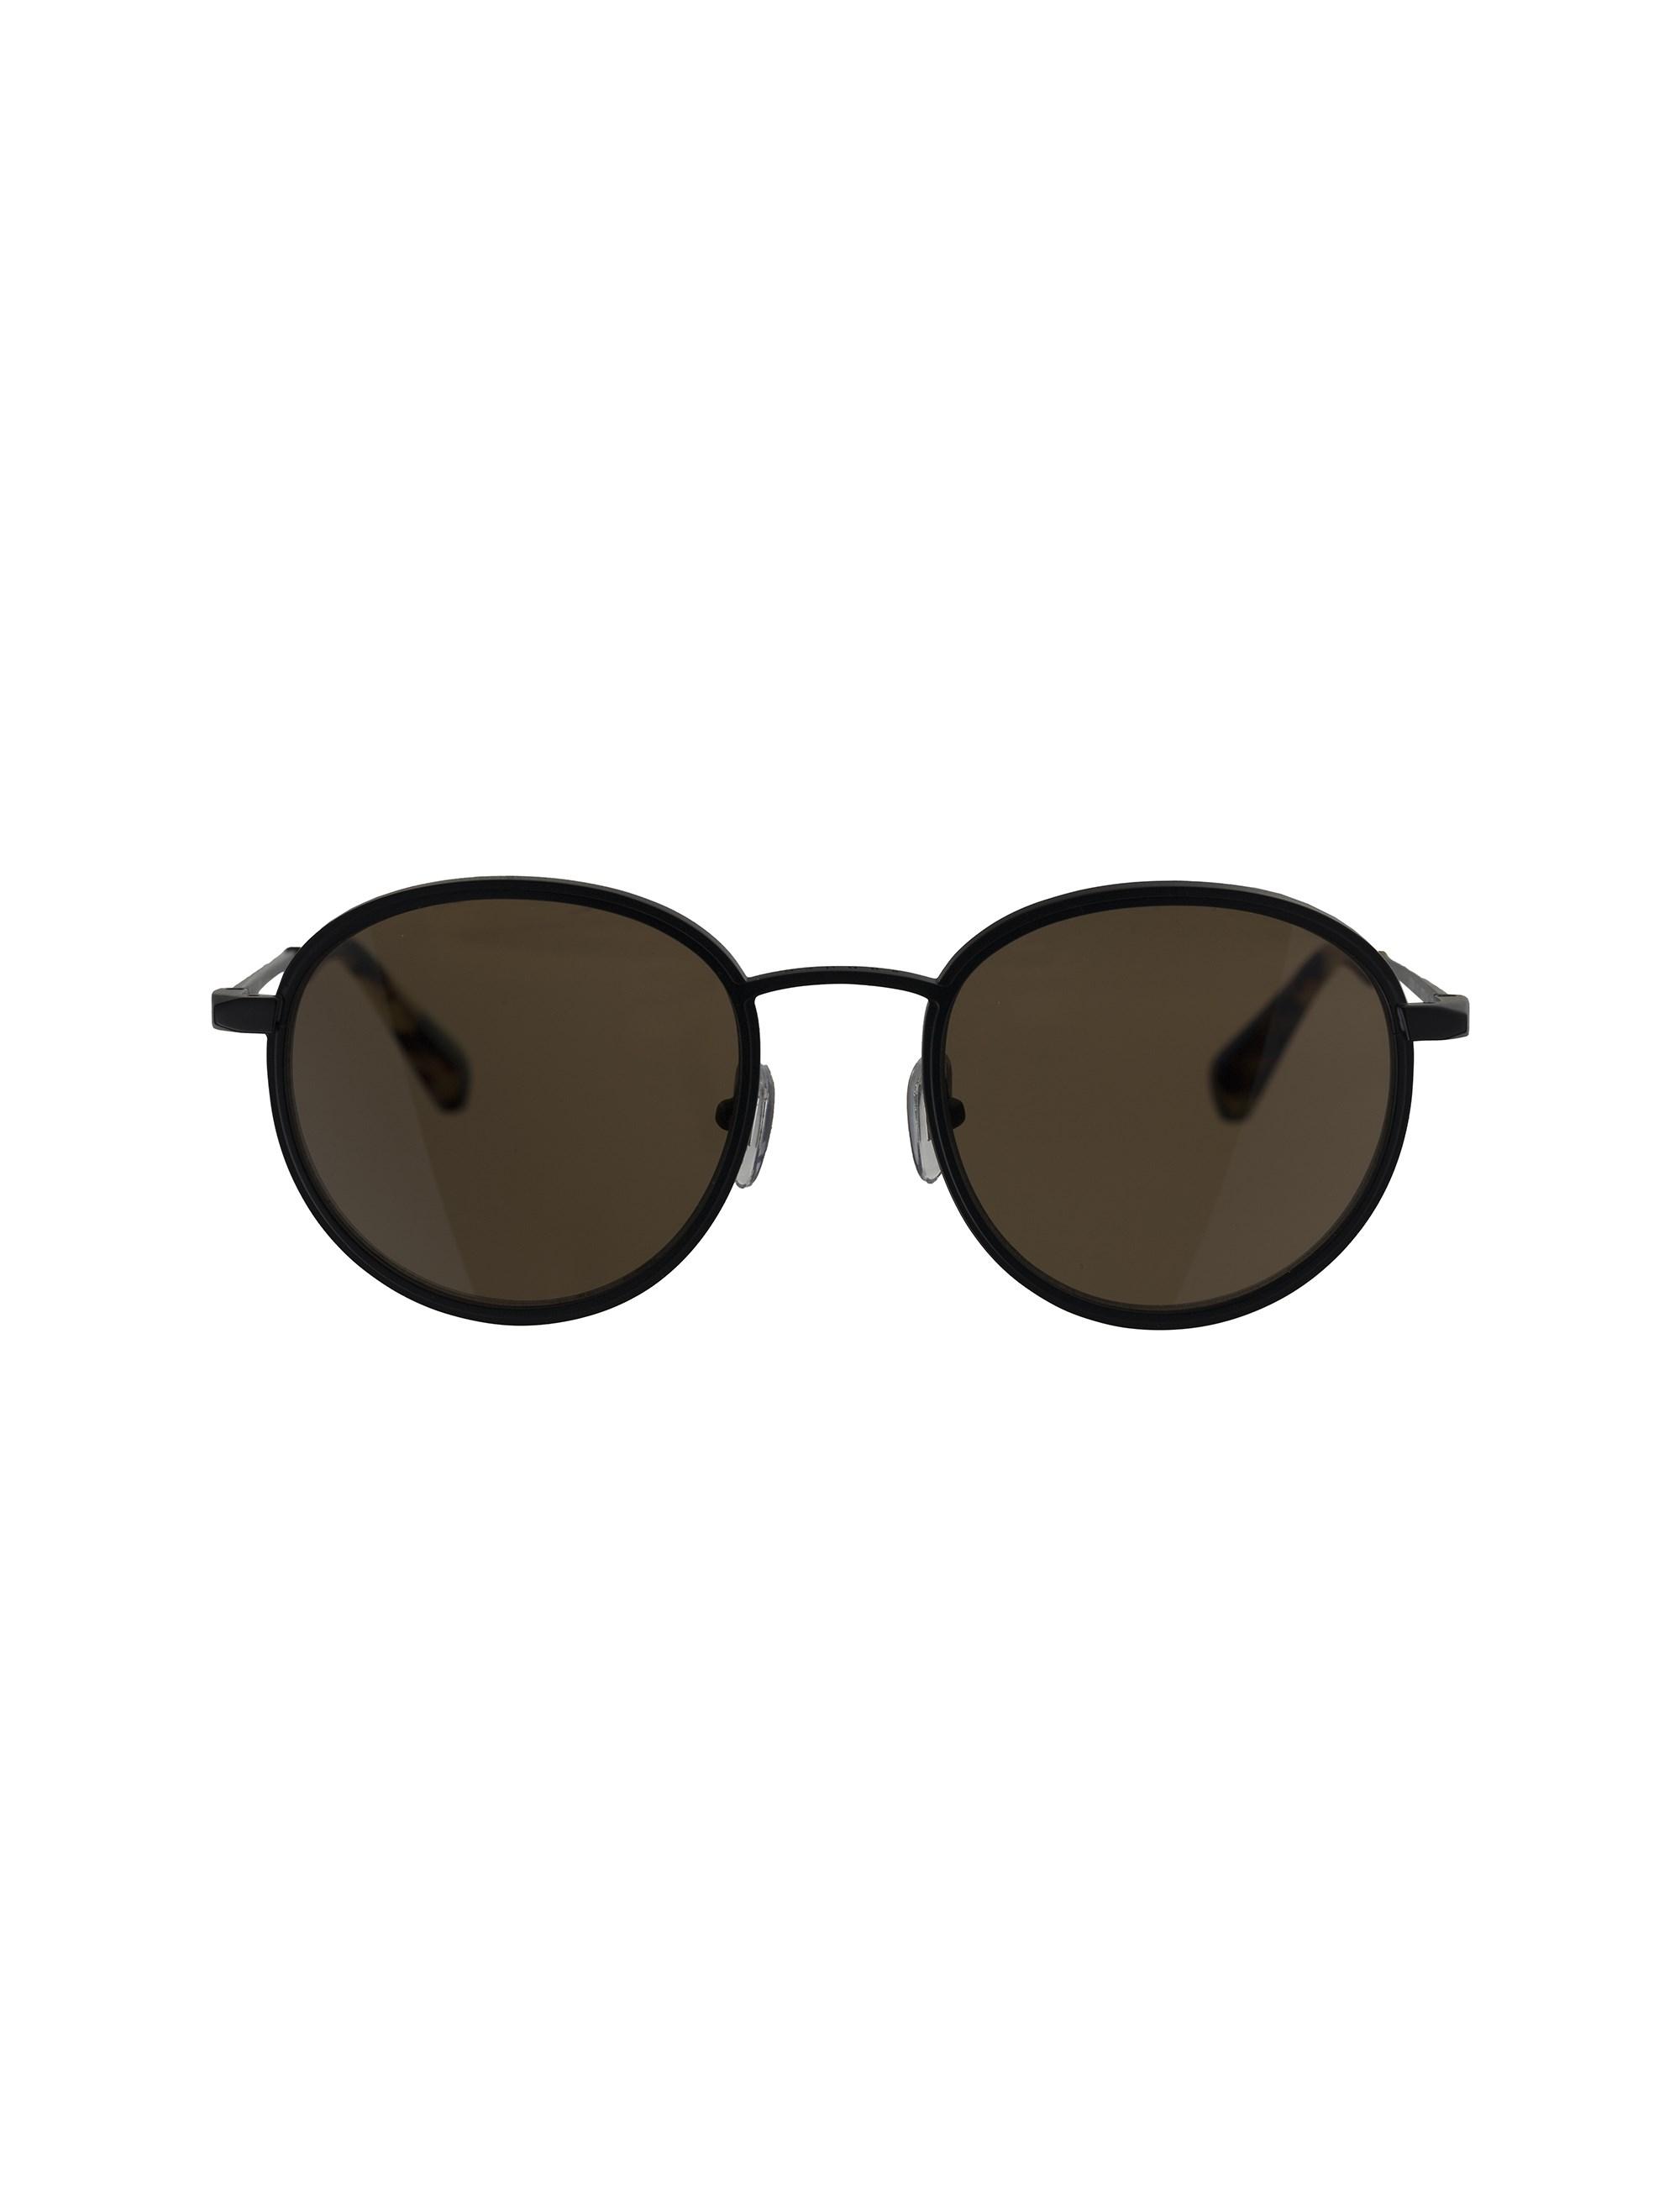 عینک آفتابی گرد بزرگسال - ساندرو - مشکي        - 1